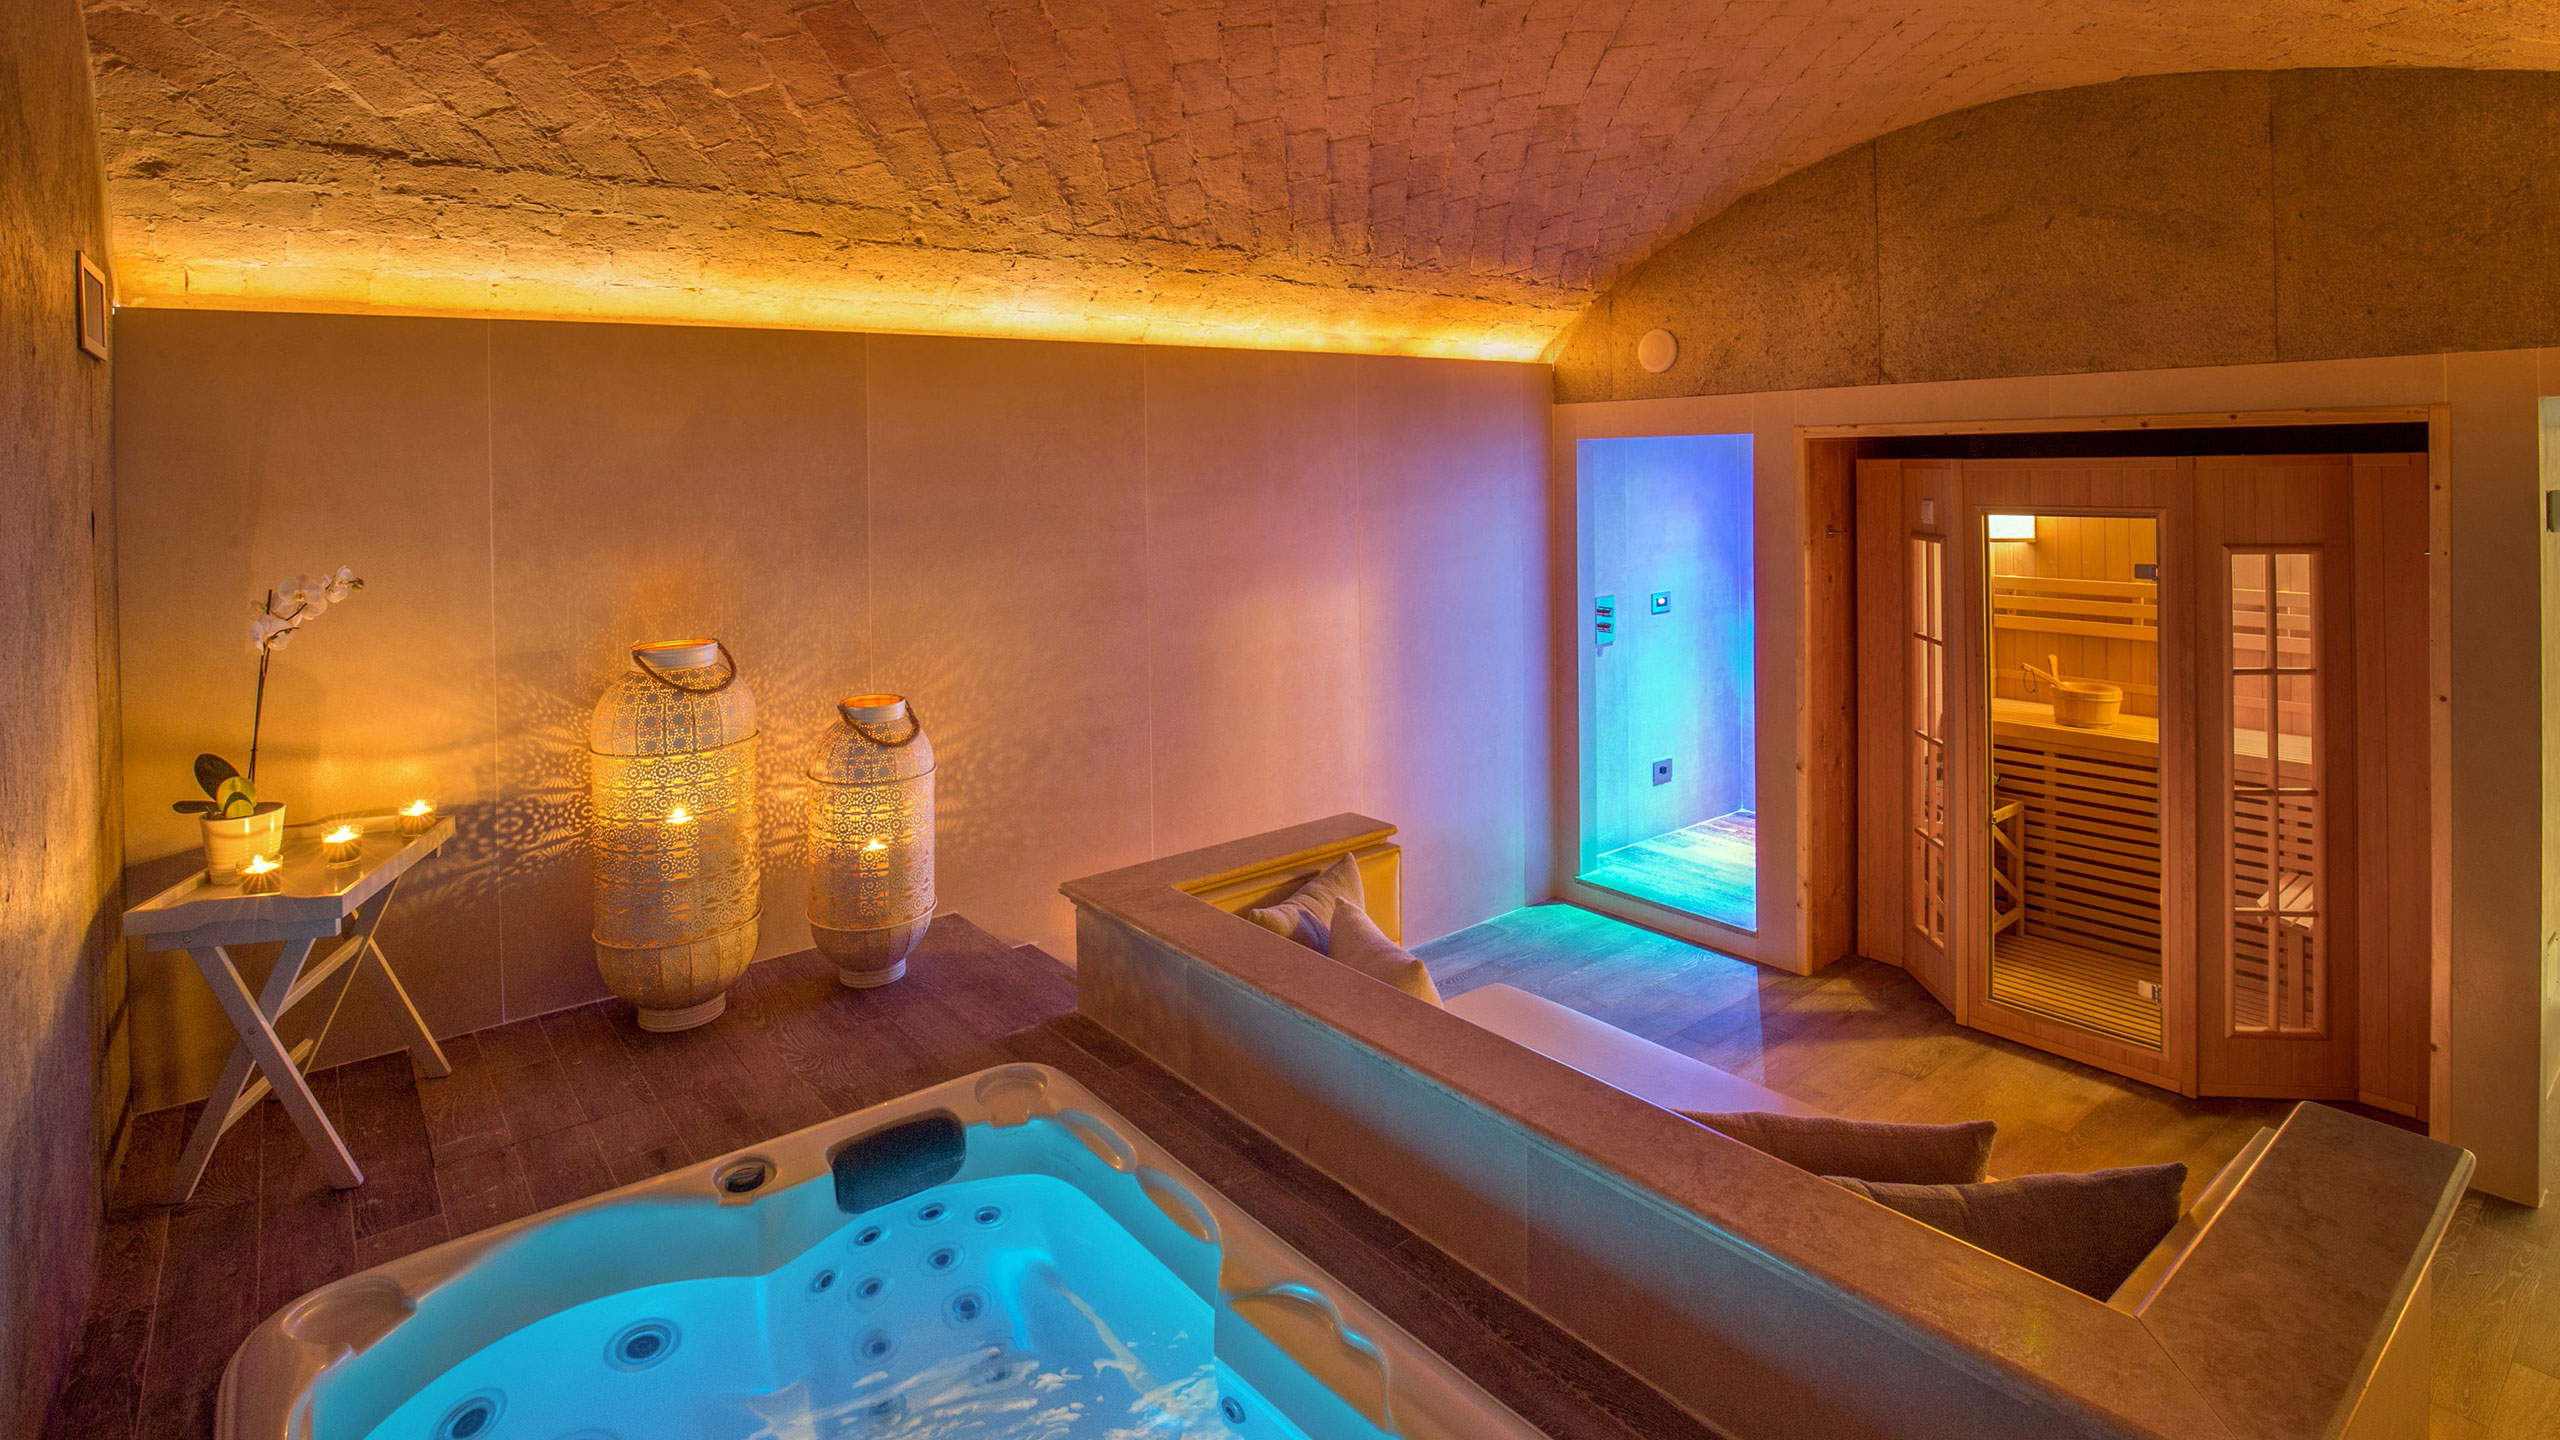 Piccolo-borgo-spa-7519nn-slide